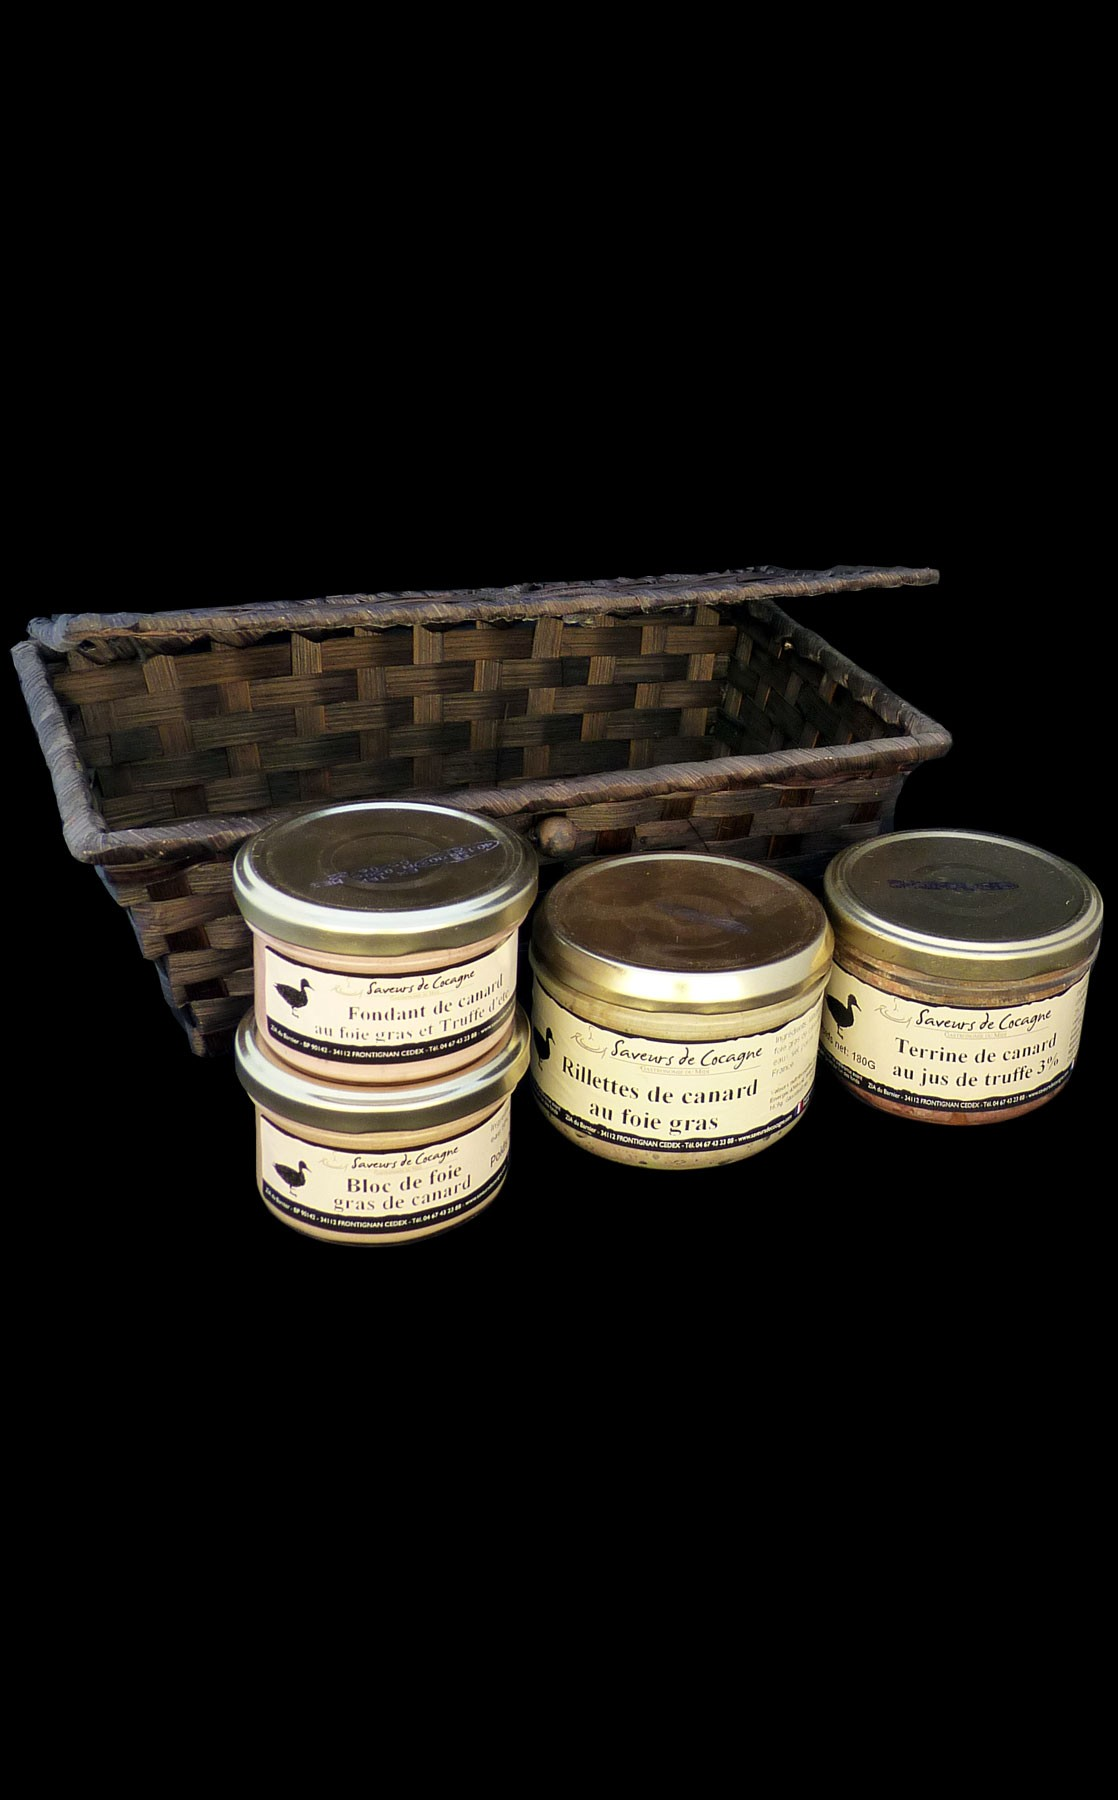 Coffret festif foie gras